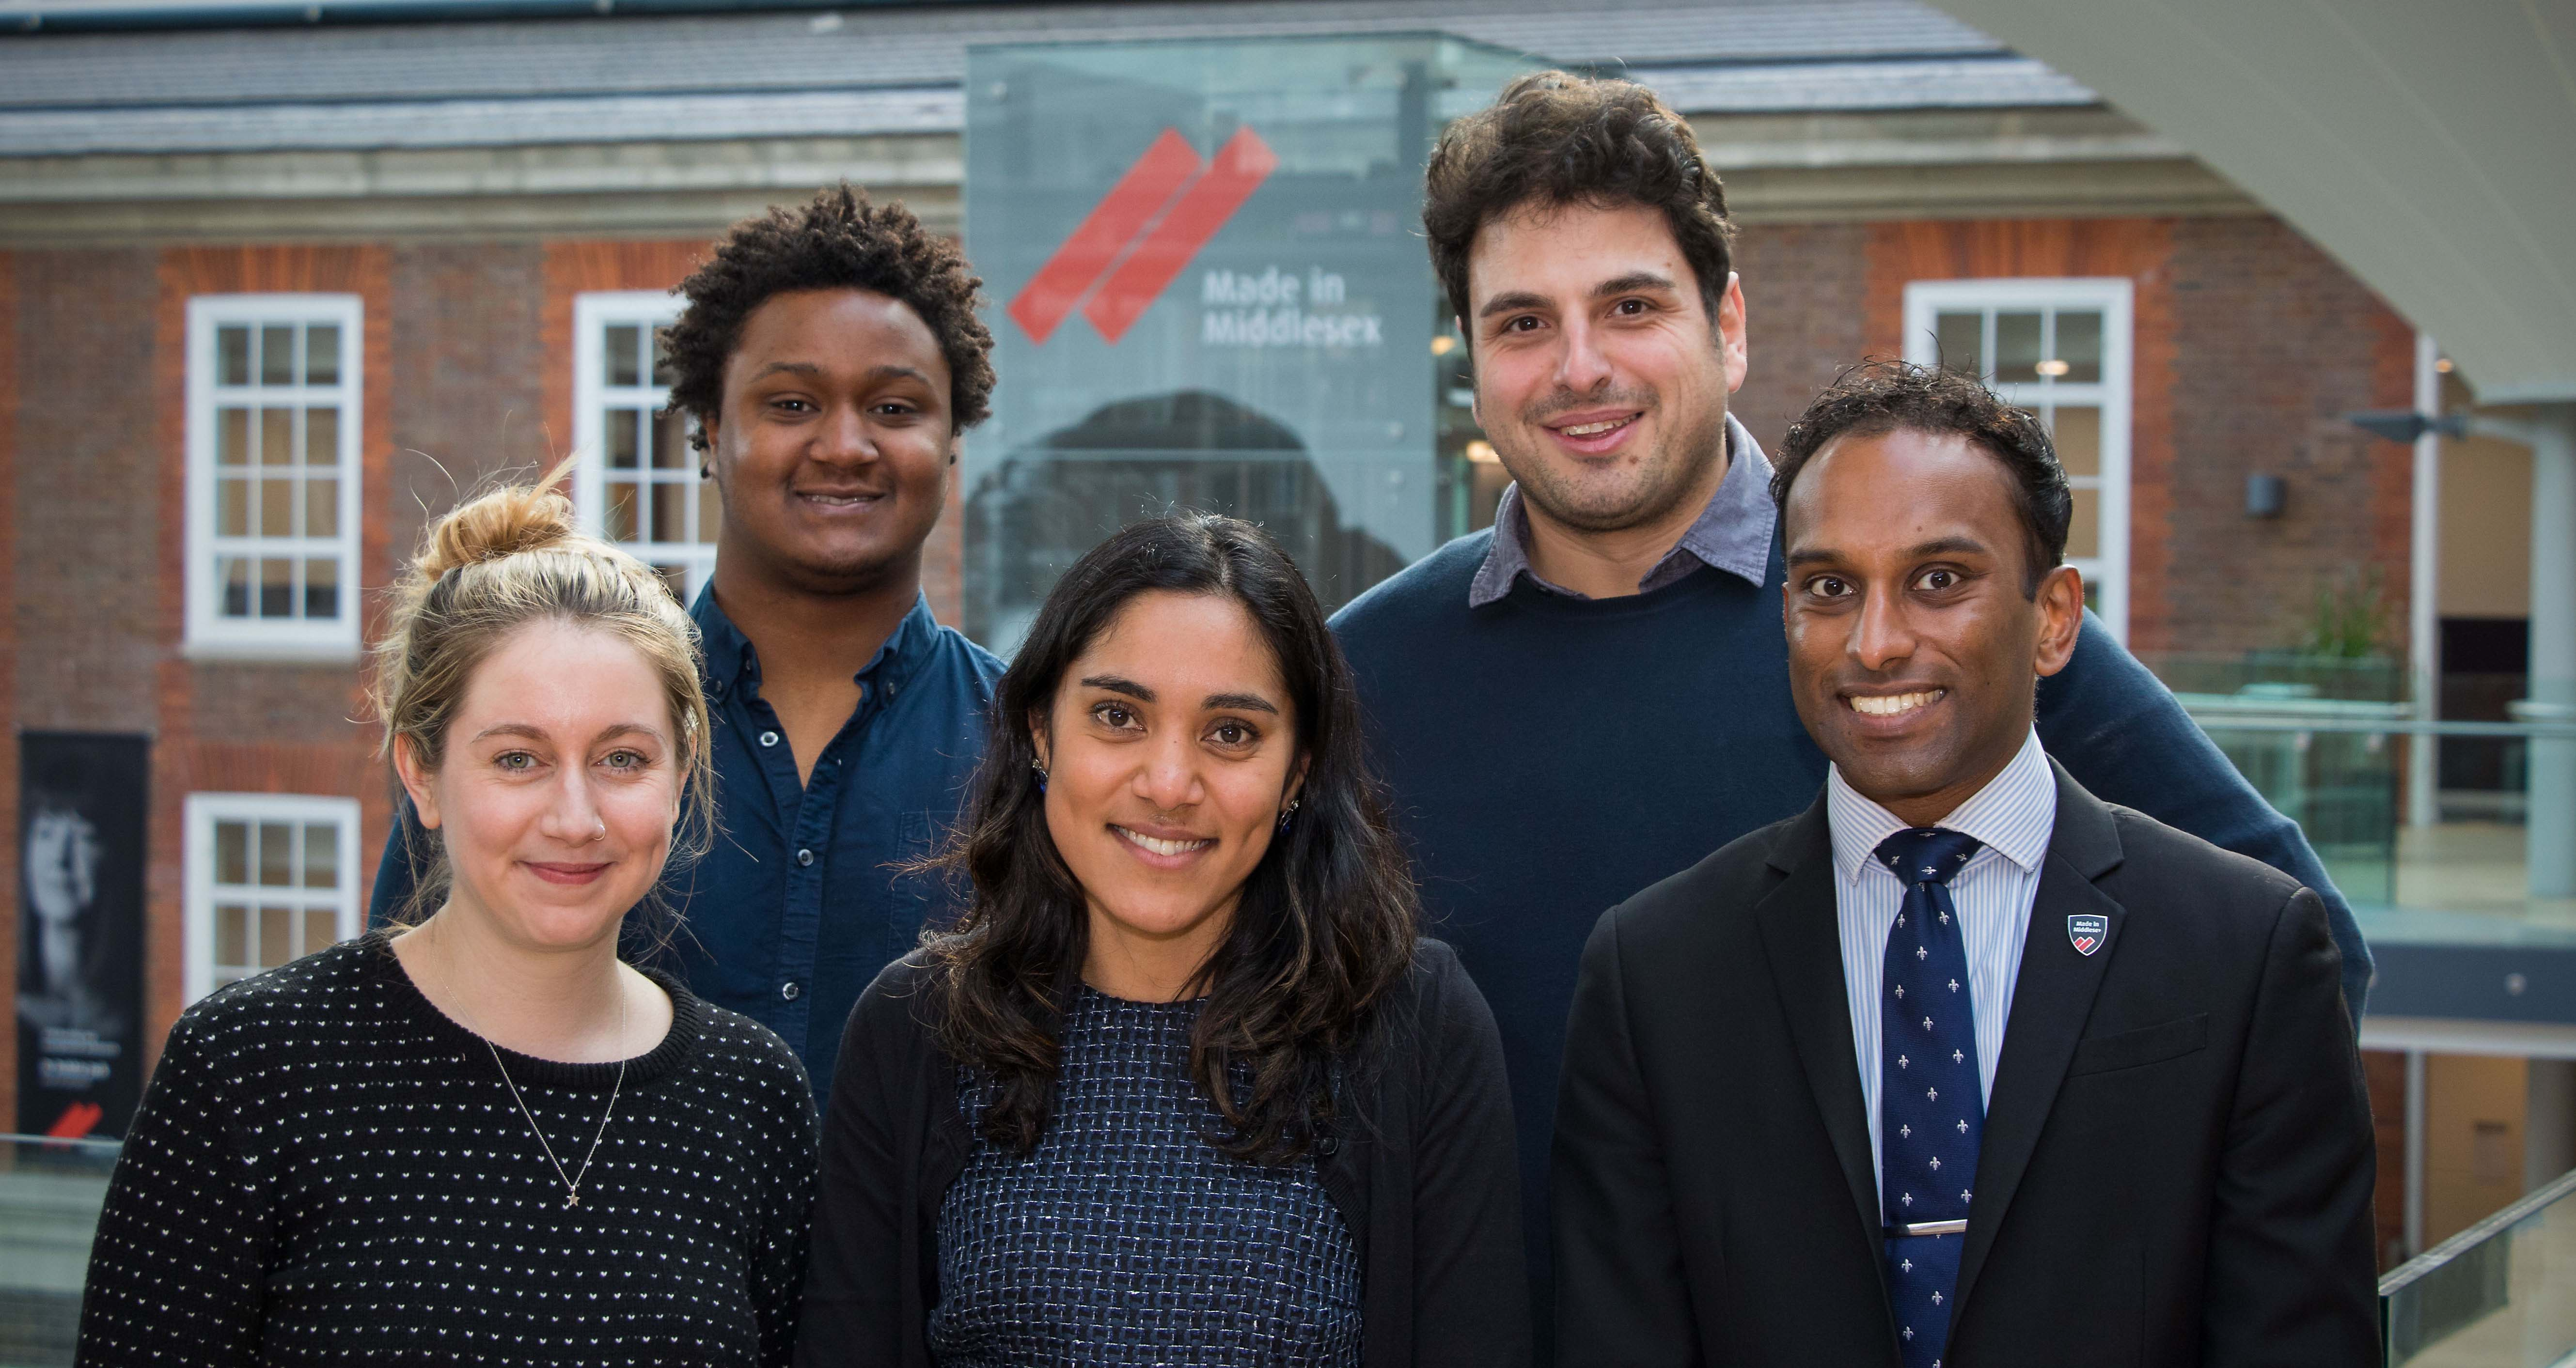 Middlesex University Alumni Team 2018